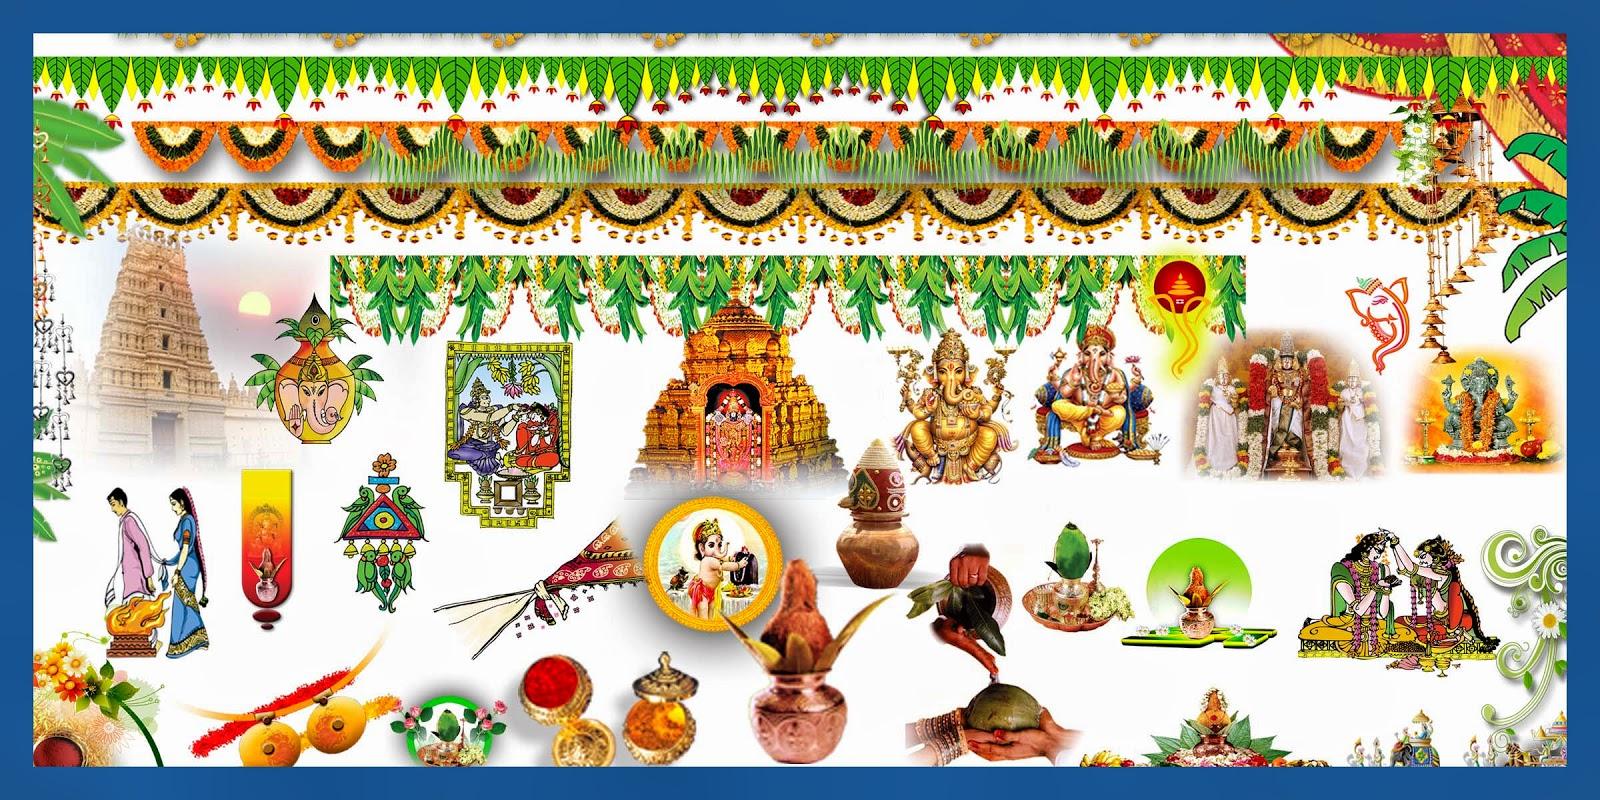 Hindu wedding clipart psd 8 » Clipart Station.